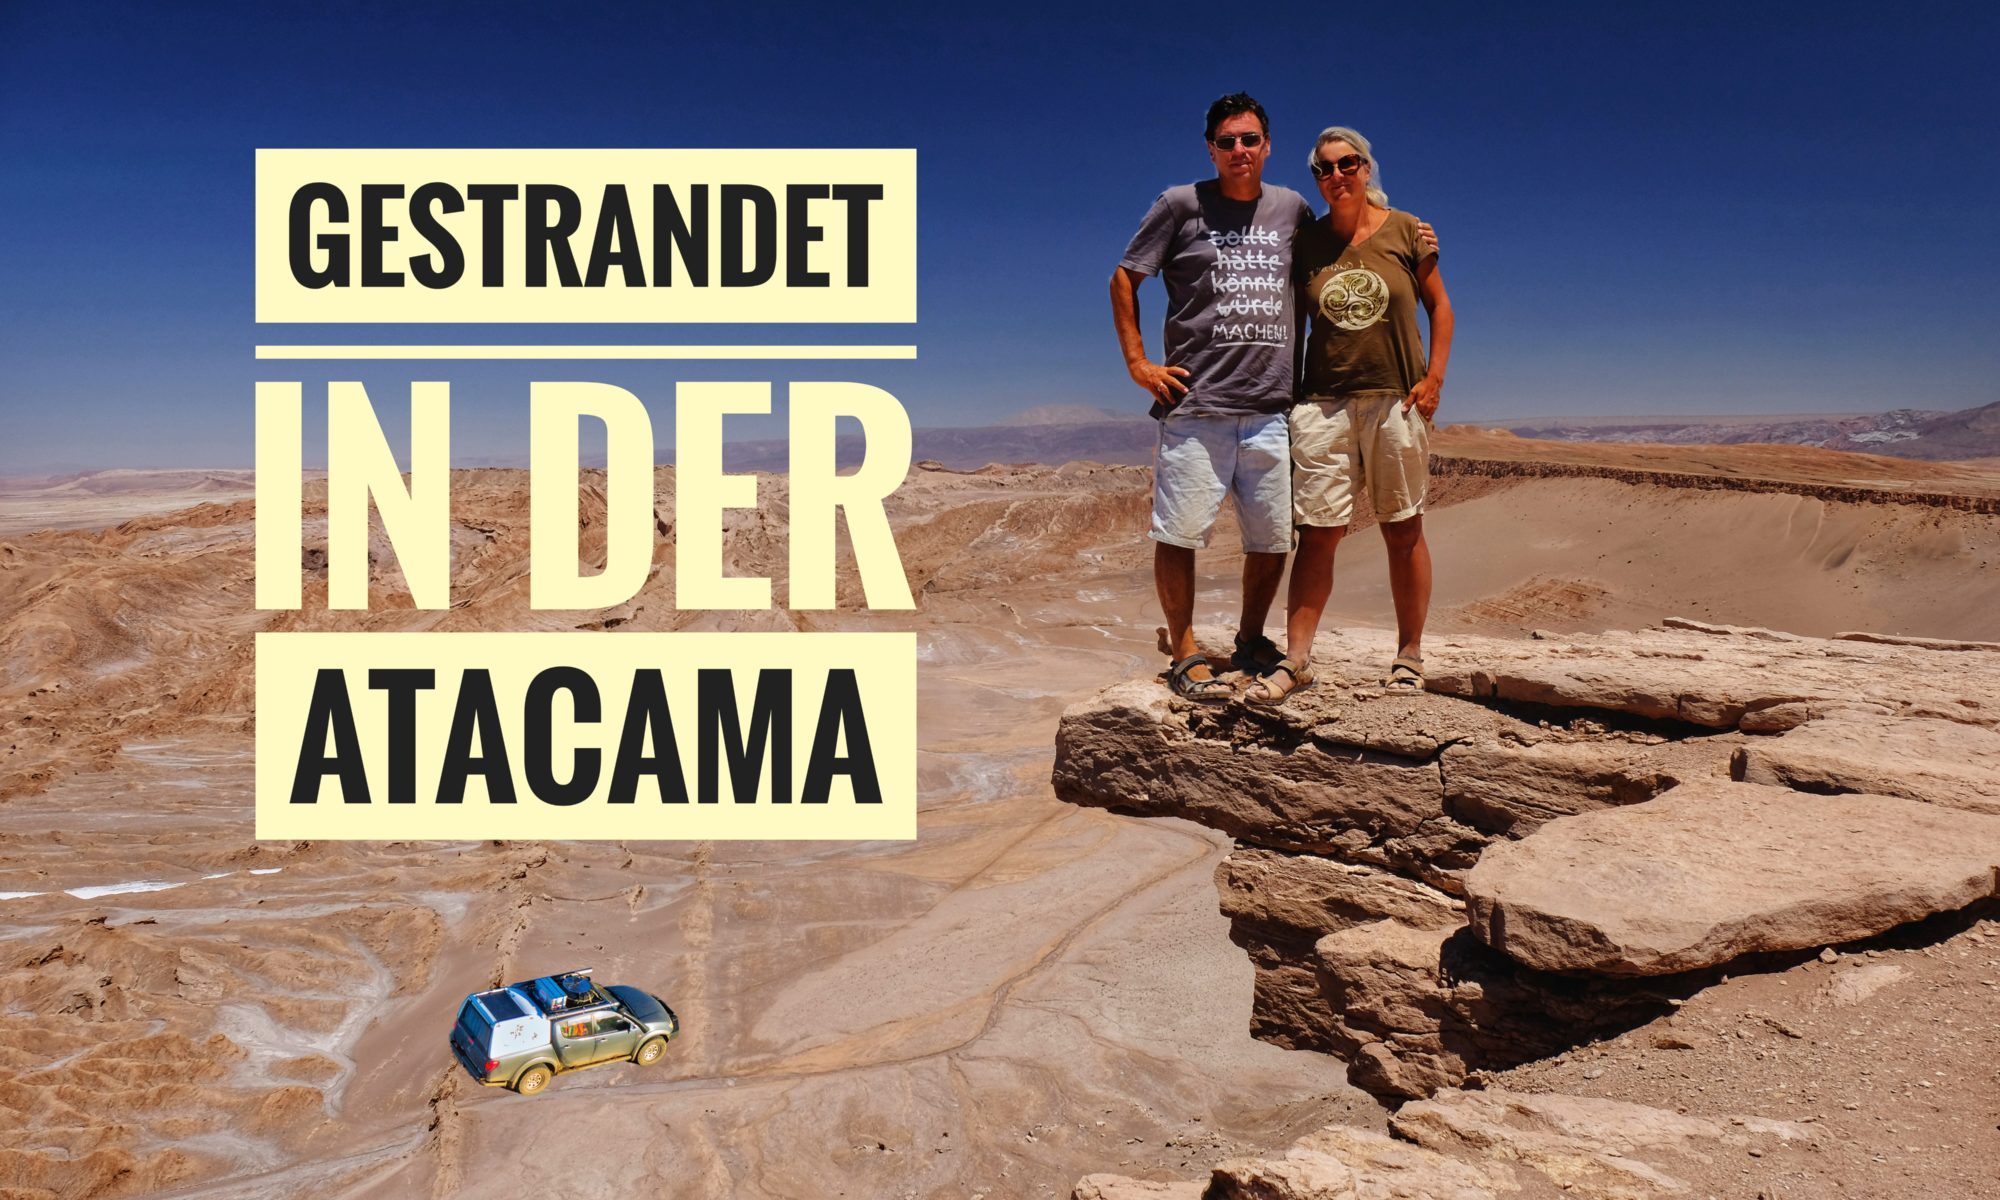 Gestrandet in der Atacama